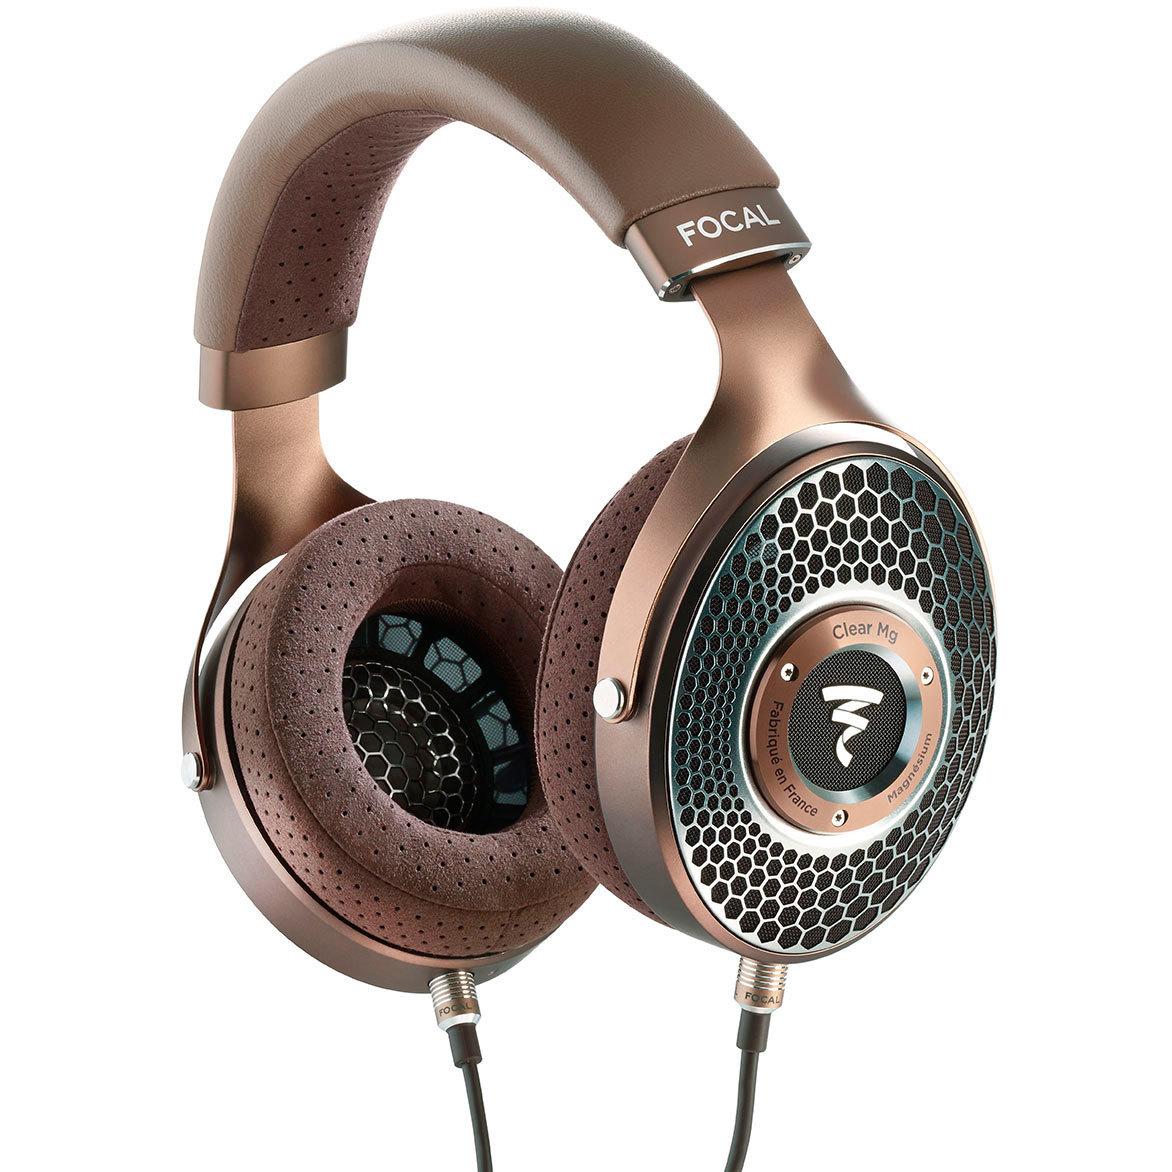 Focal Headphones Clear MG